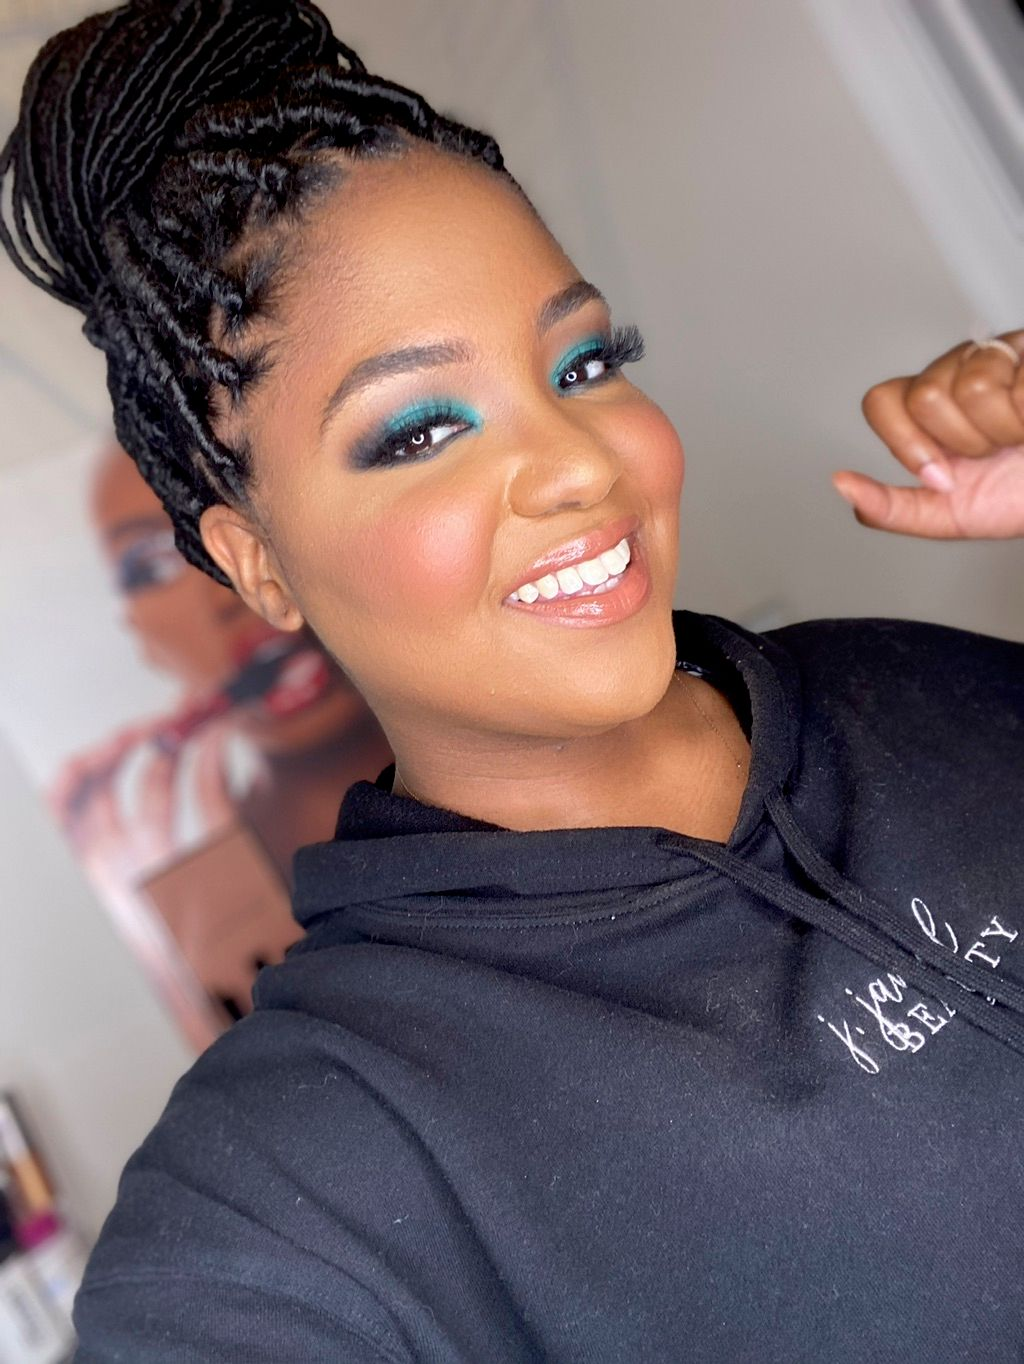 J. Jamal Beauty, LLC